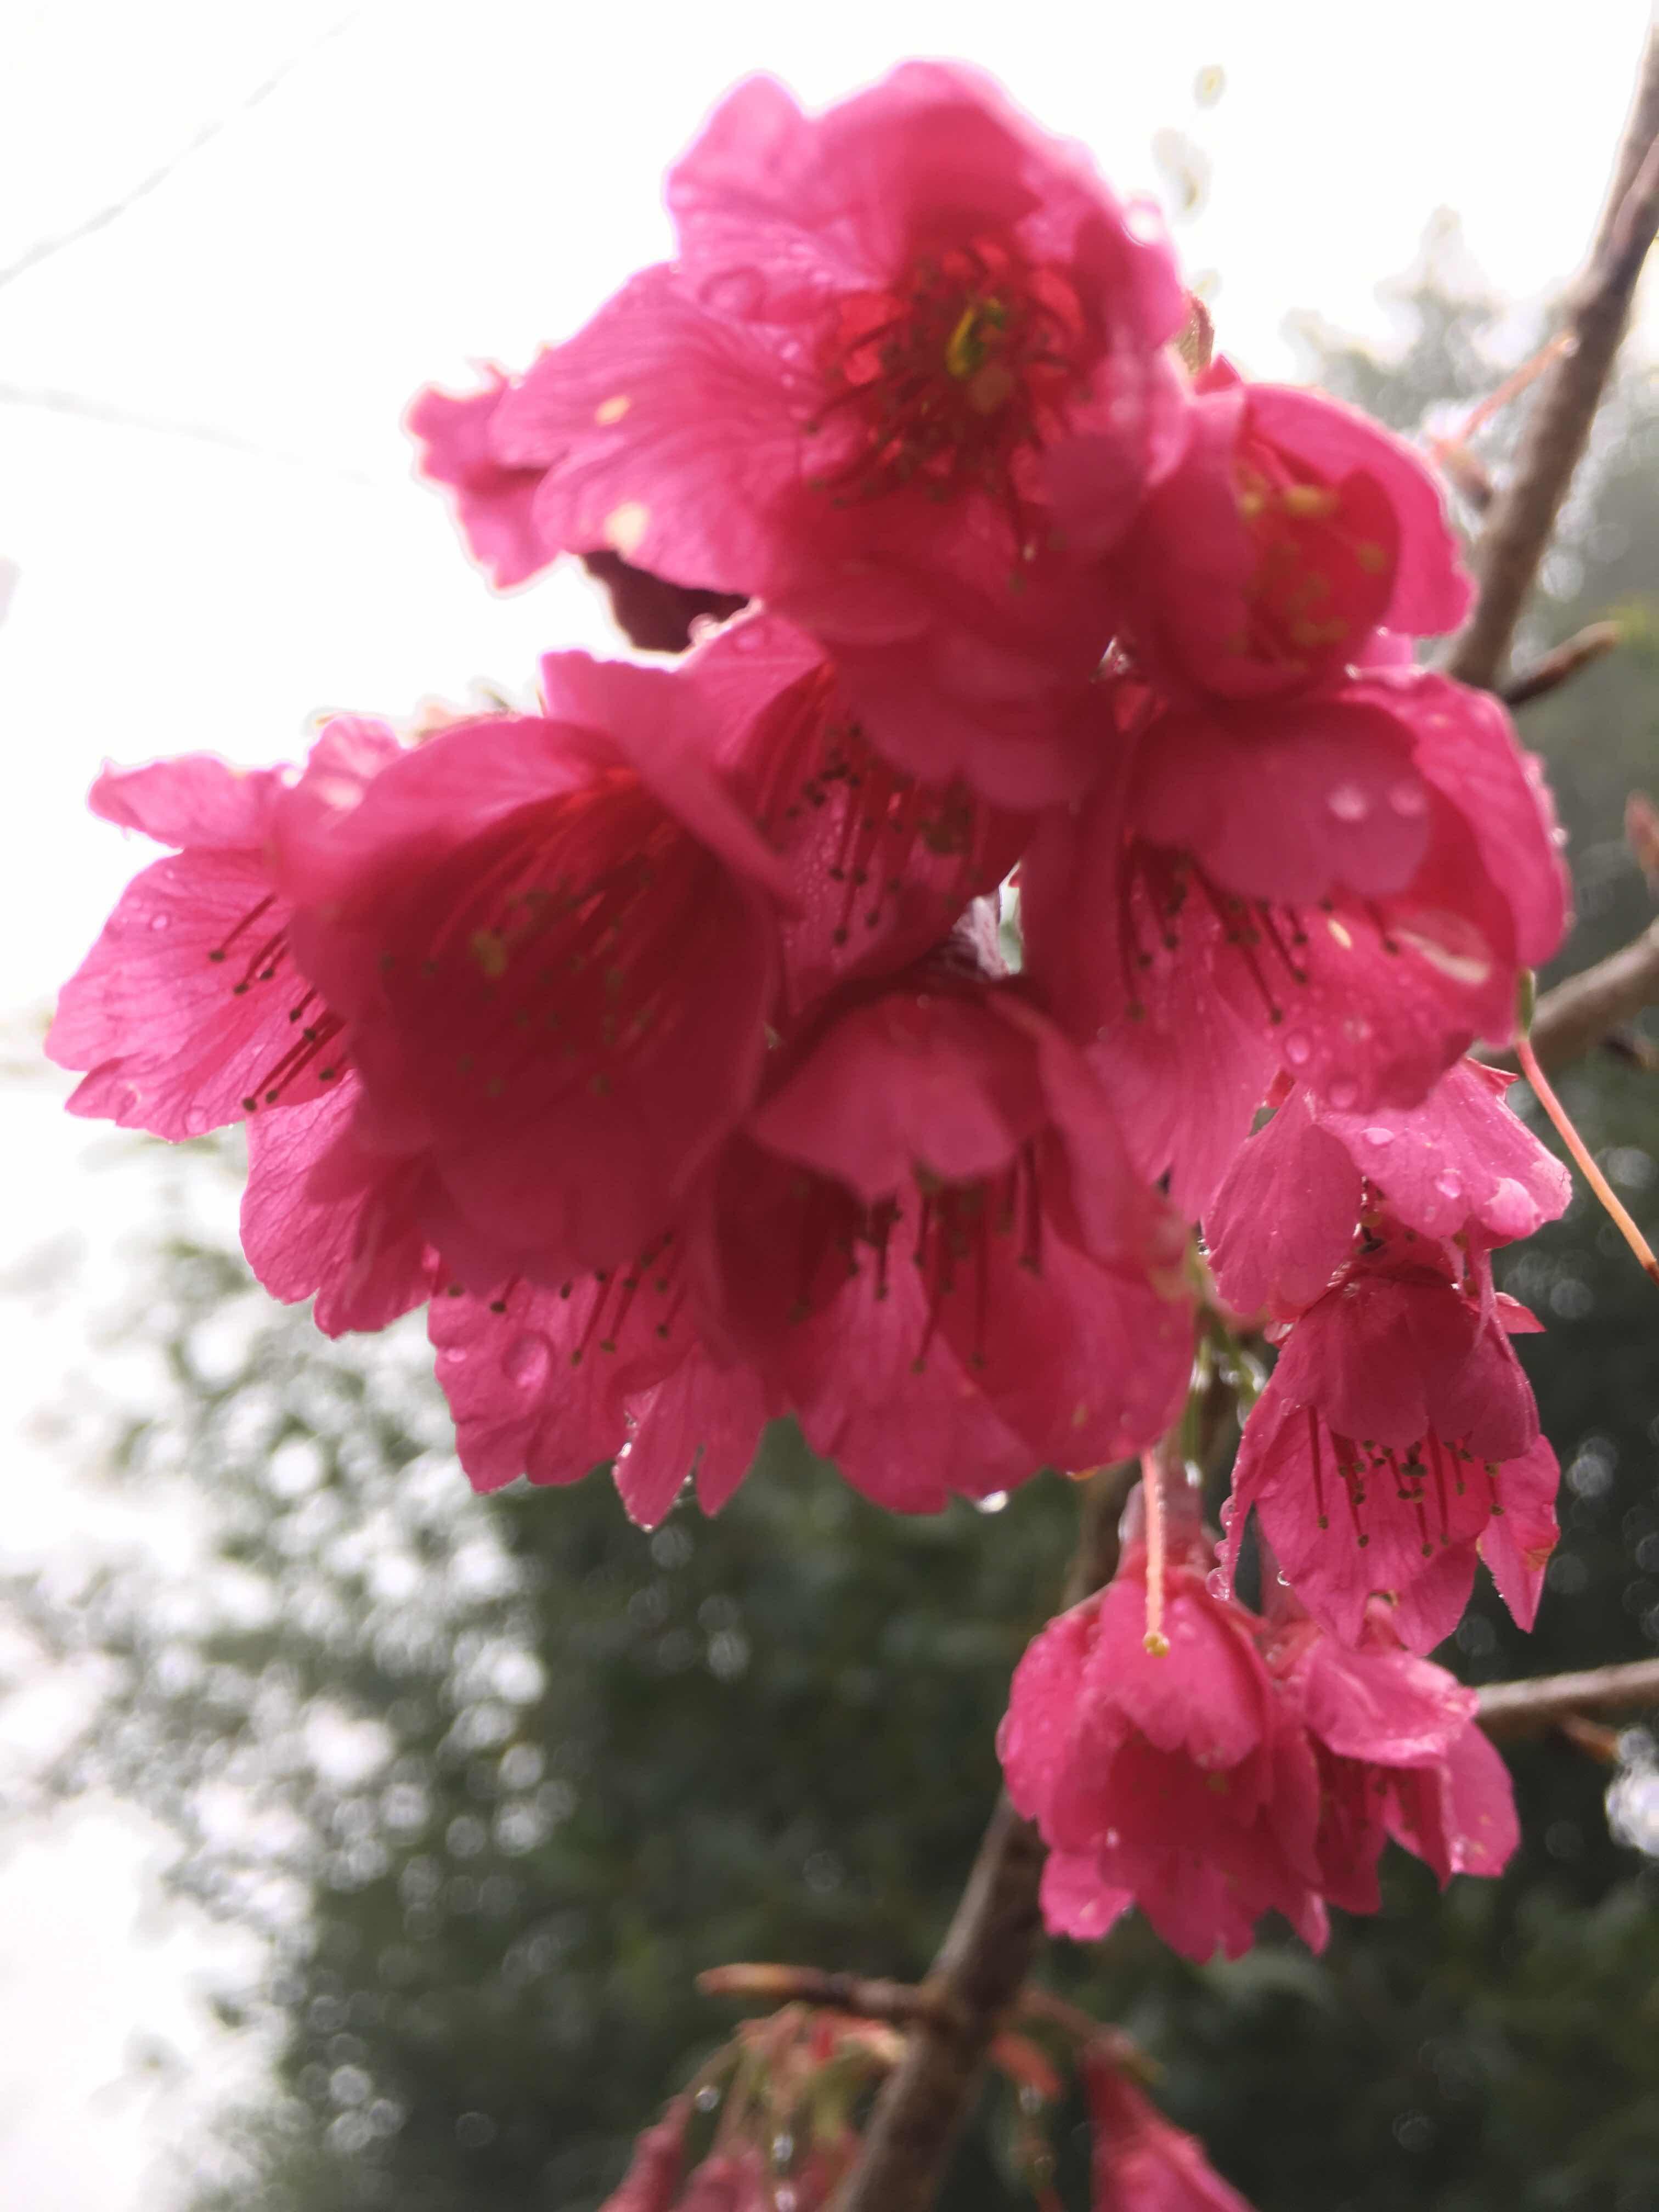 hehuanshan nantou taiwan cherry blossom